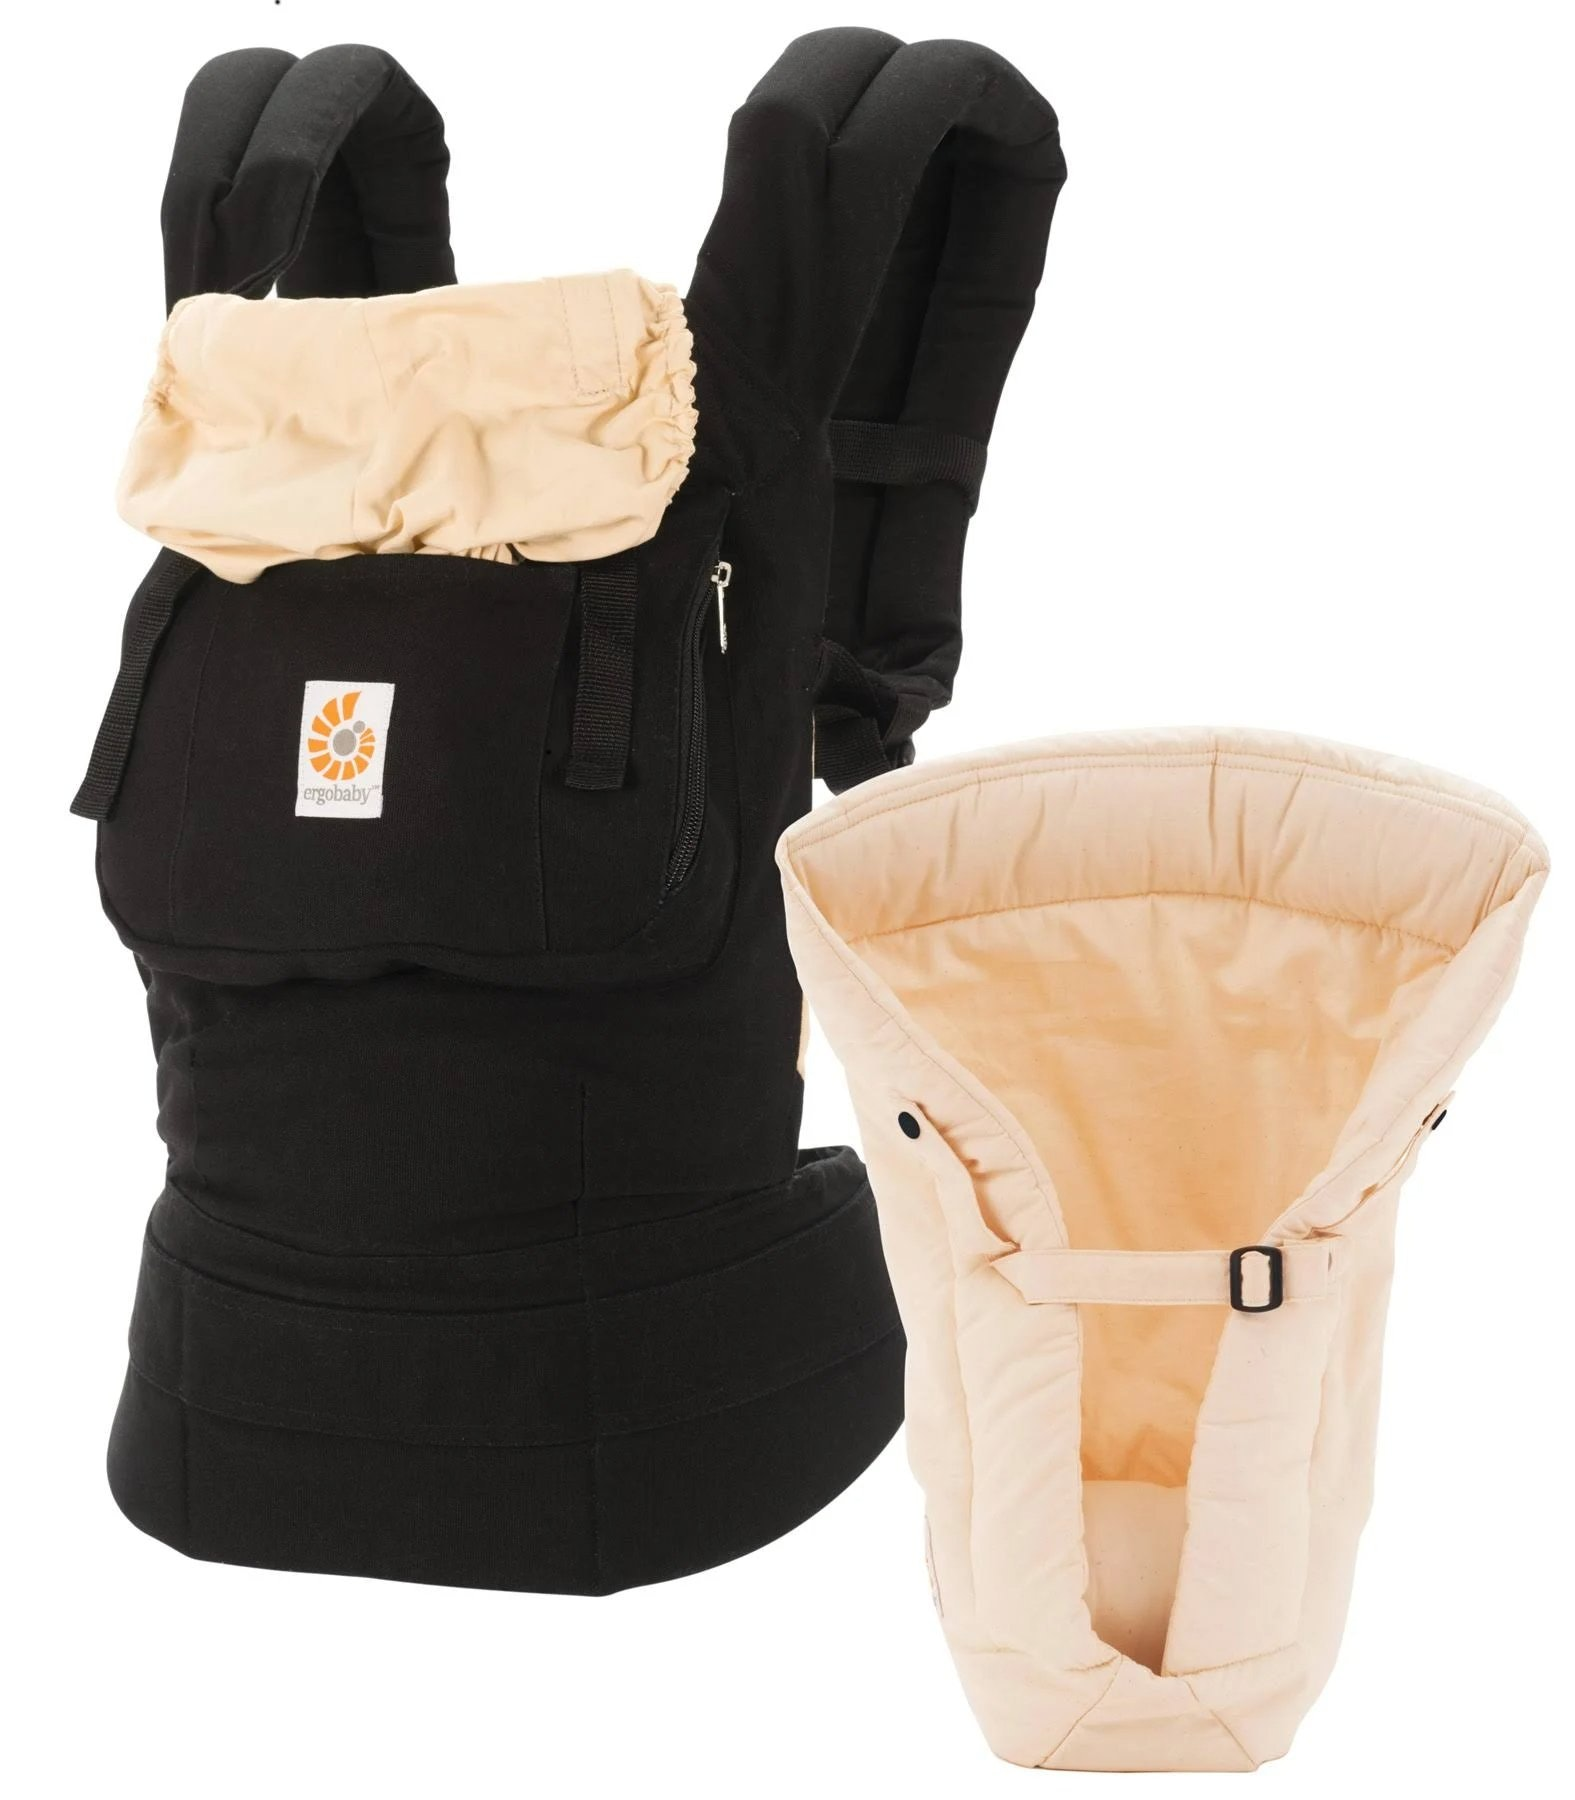 Ergobaby Original Bundle of Joy Baby Carrier